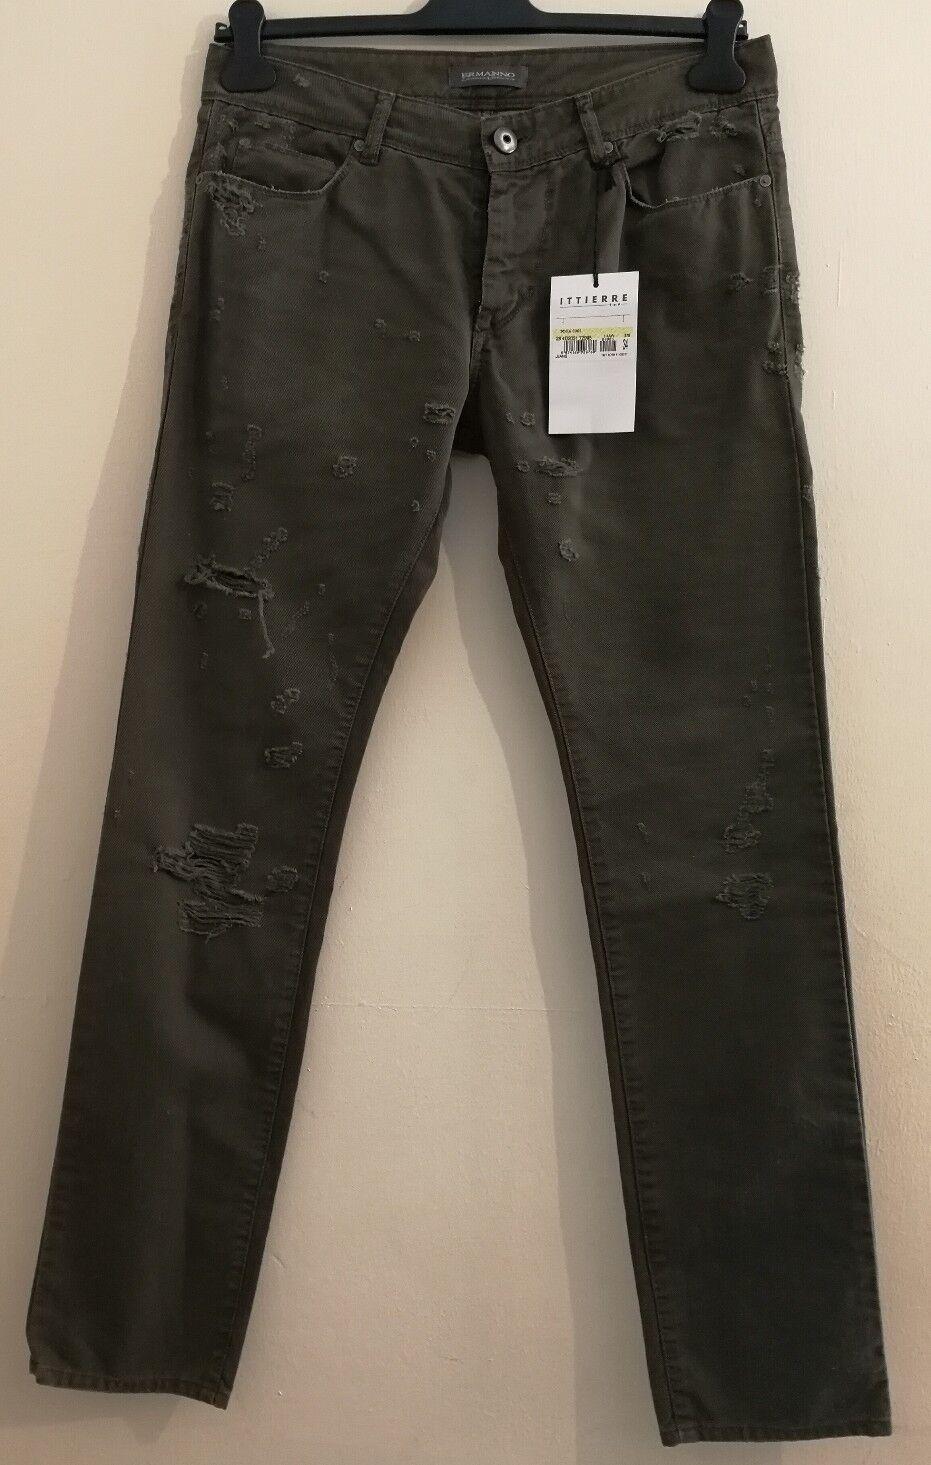 ERMANNO SCERVINO Distressed Men's Jeans Army Größe uk 32 W 33L